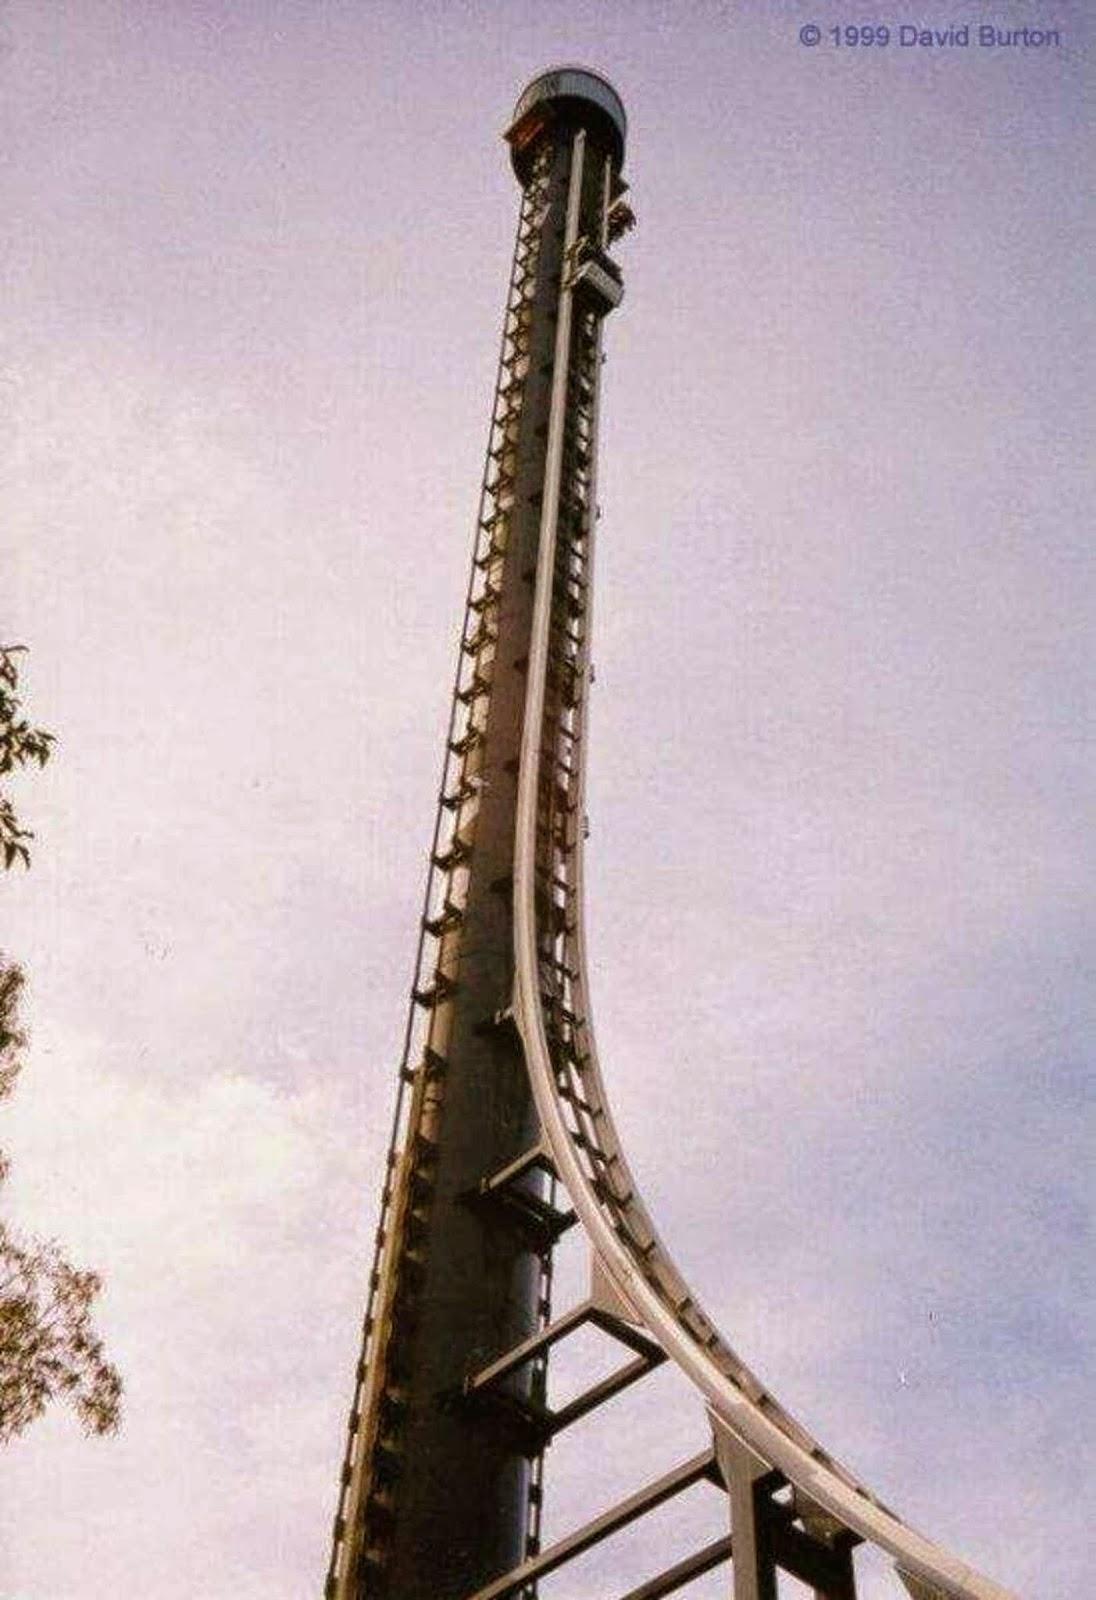 10 Amazing & Scariest Rollercoasters in the World | Tower of Terror II, Queensland, Australia